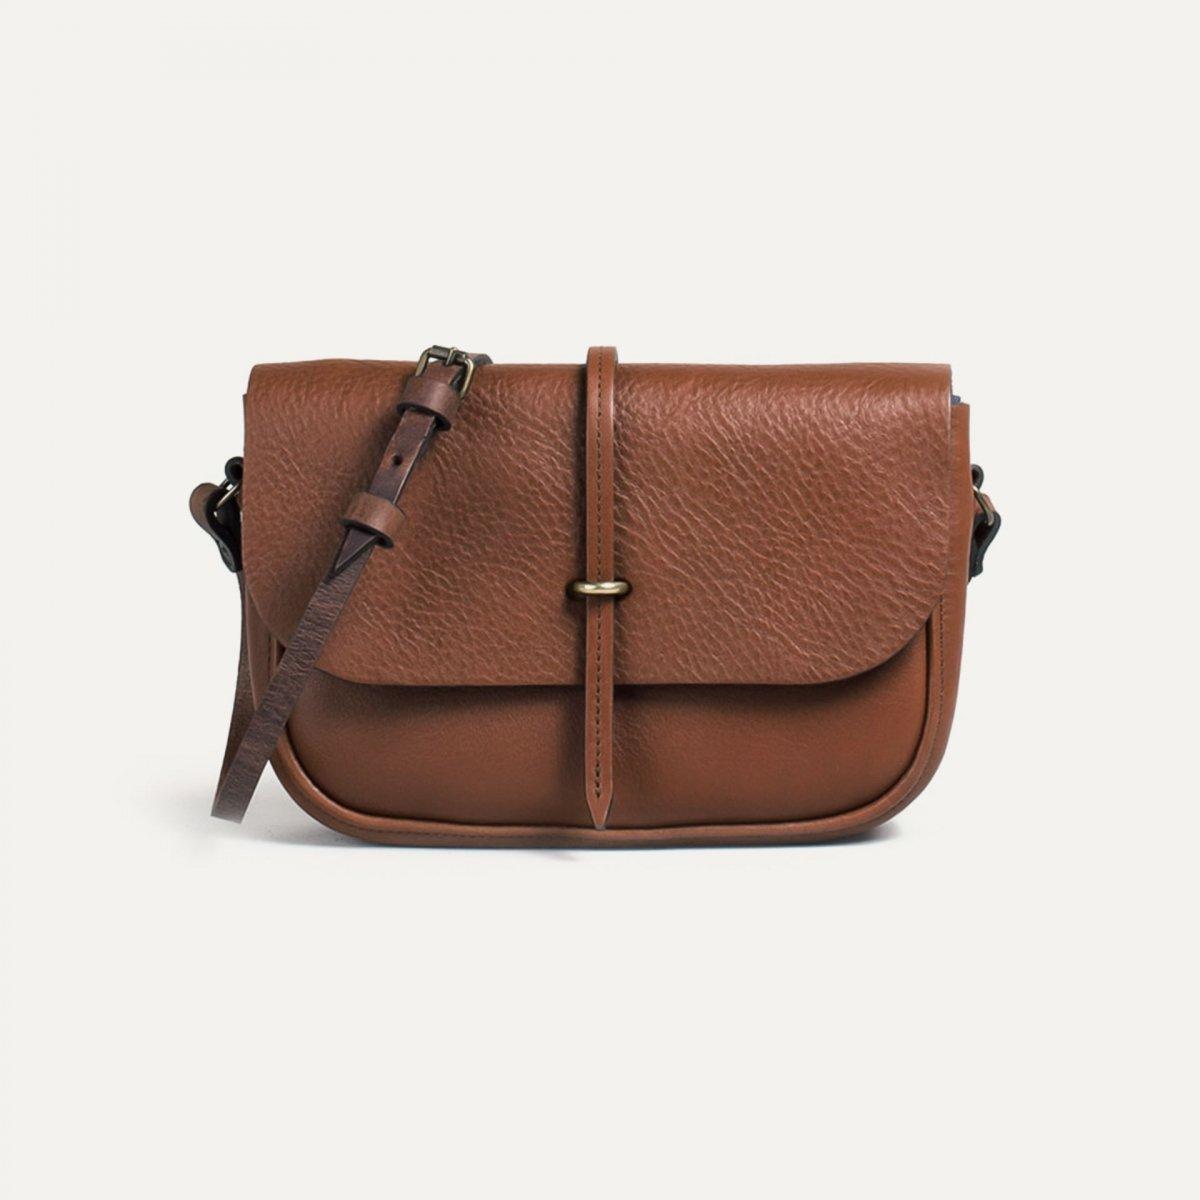 Pastis handbag - Cuba Libre (image n°1)